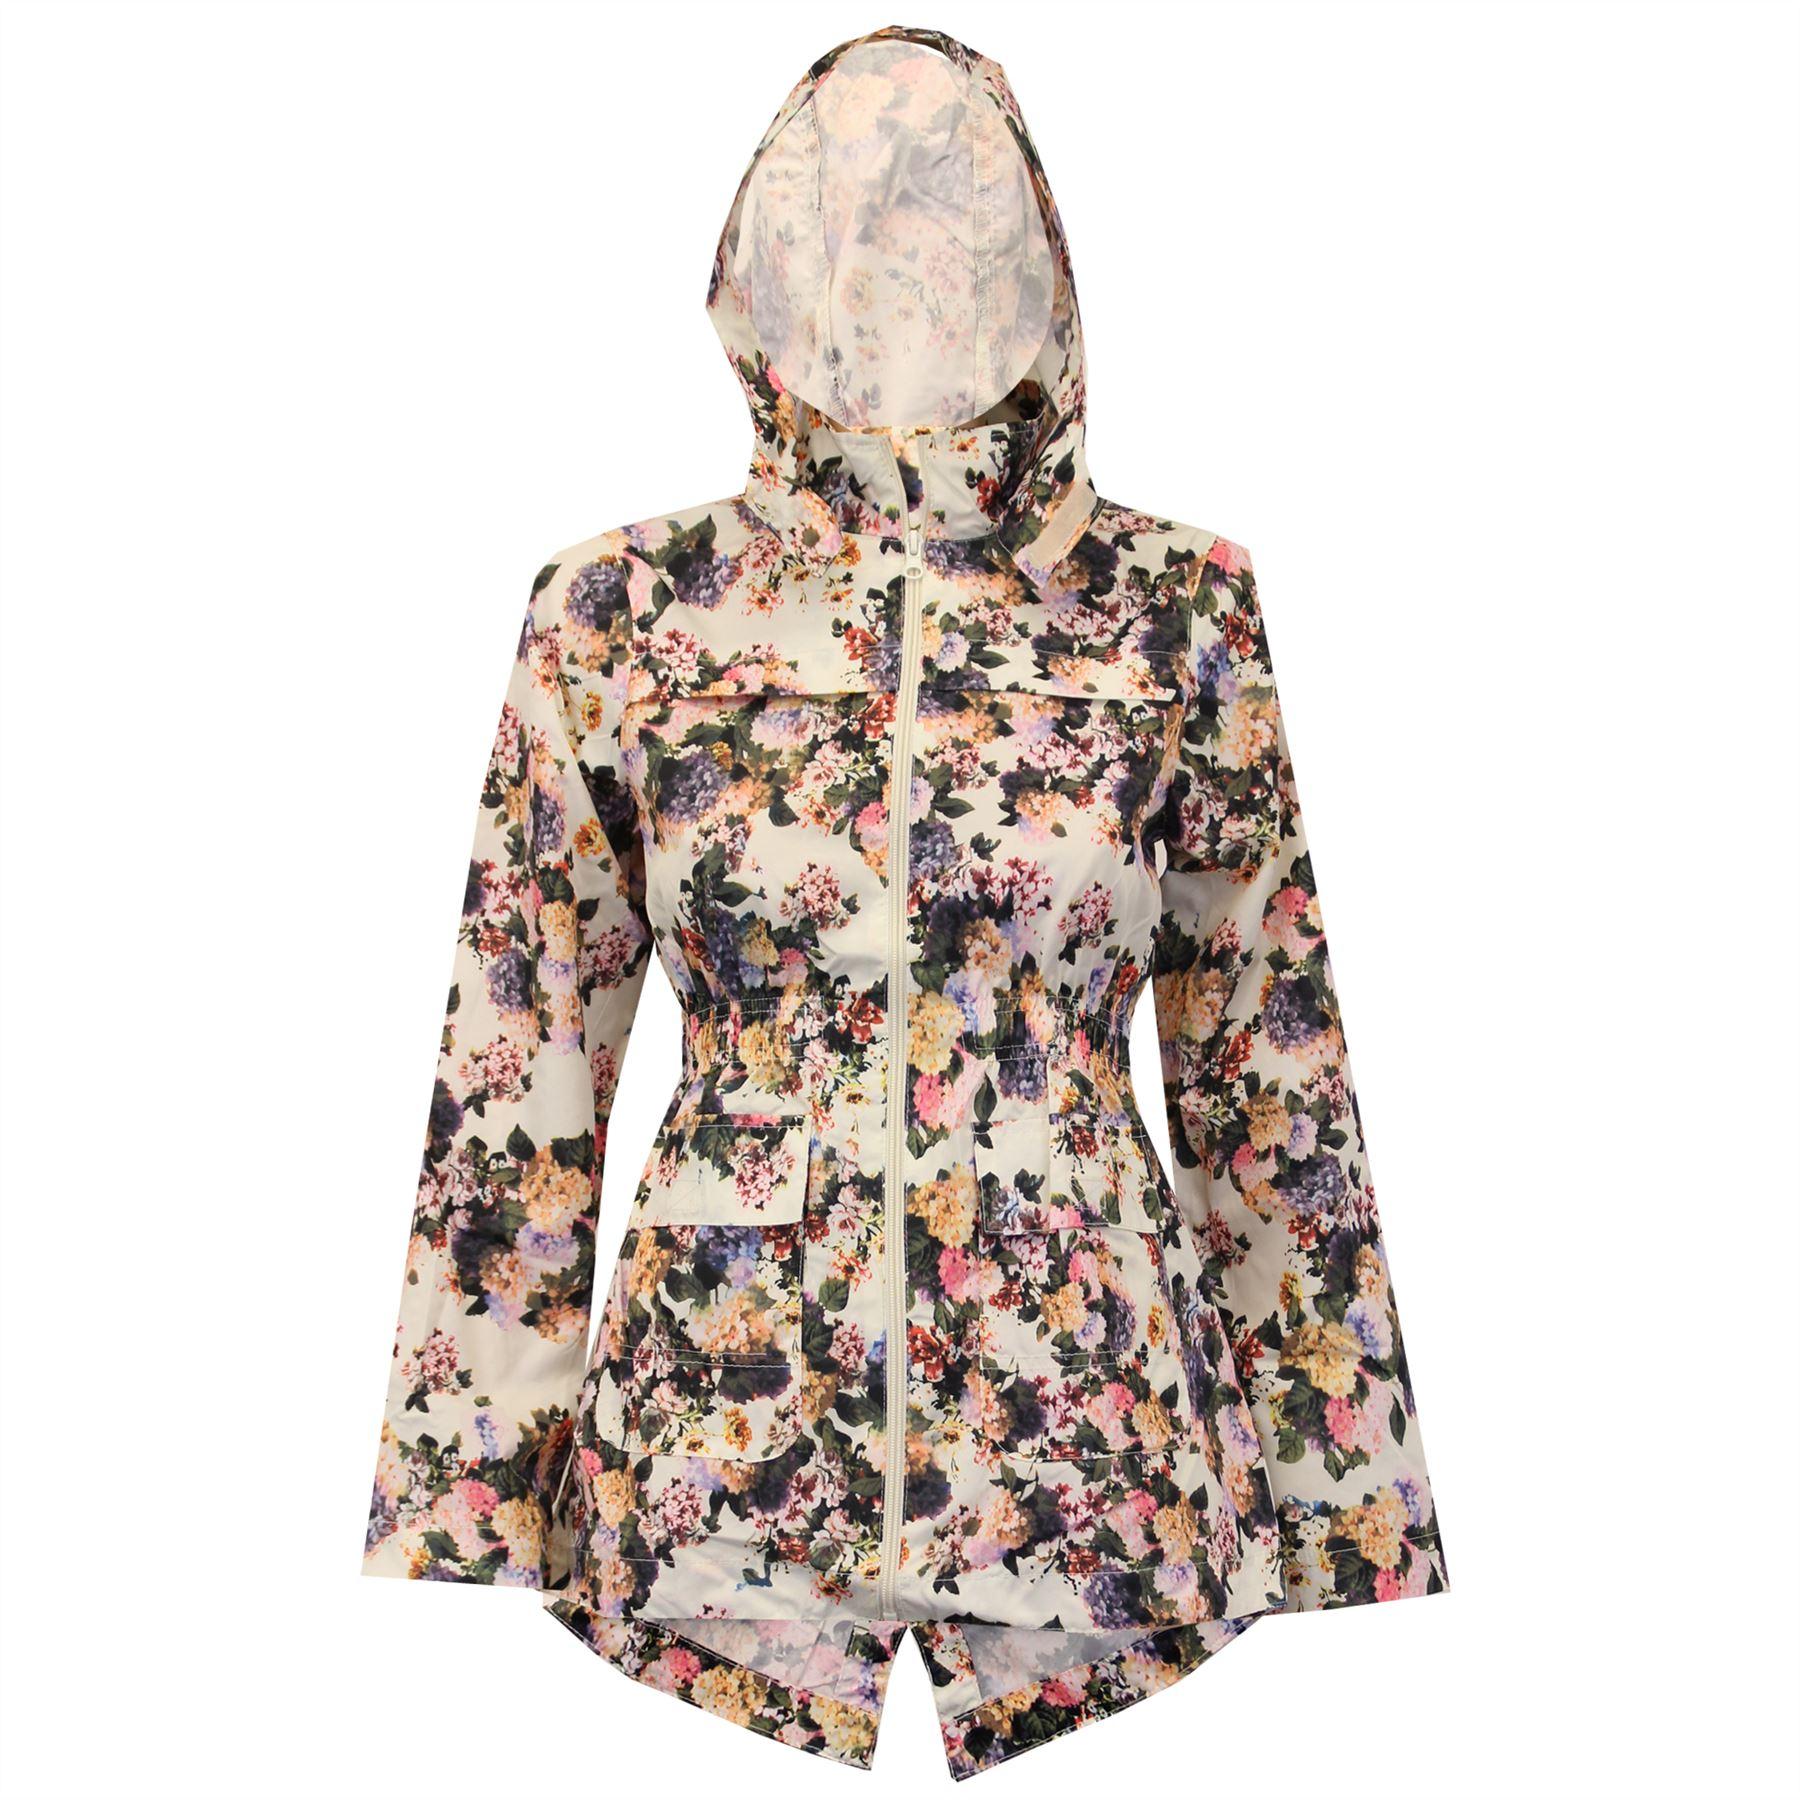 New Womens Girls Hooded Fishtail Showerproof Light Rain Jacket